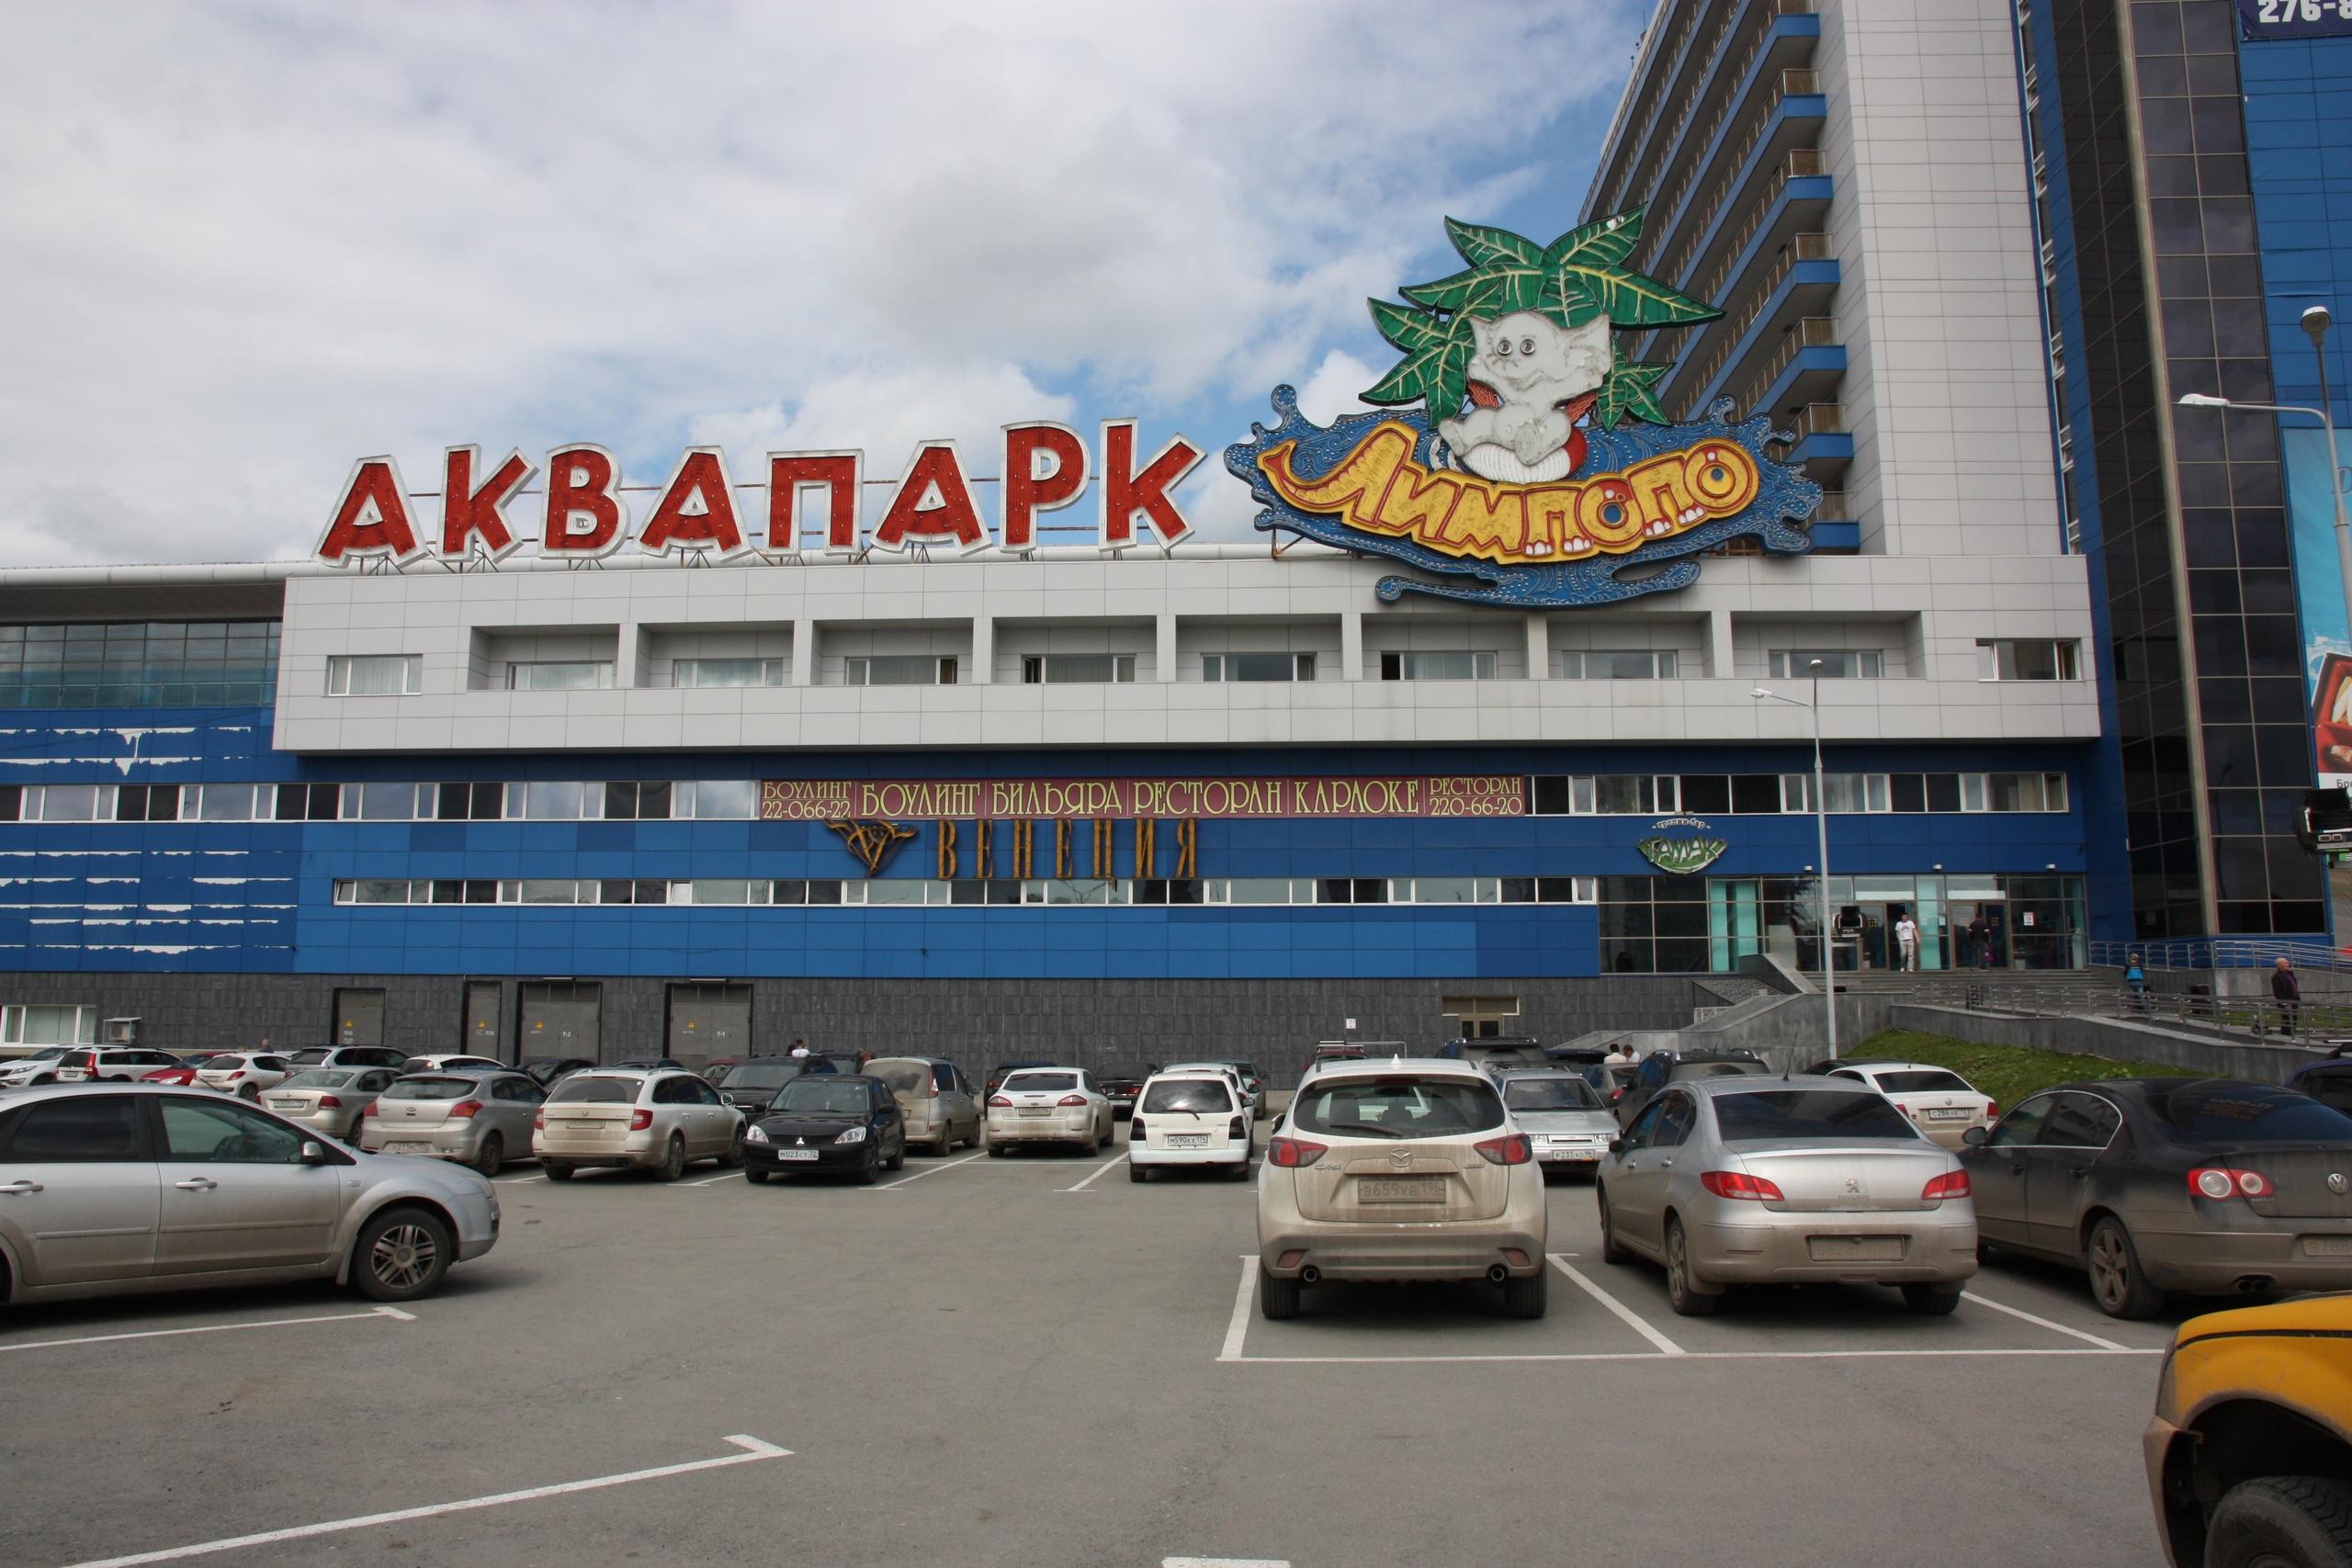 Аквапарк в Екатеринбург